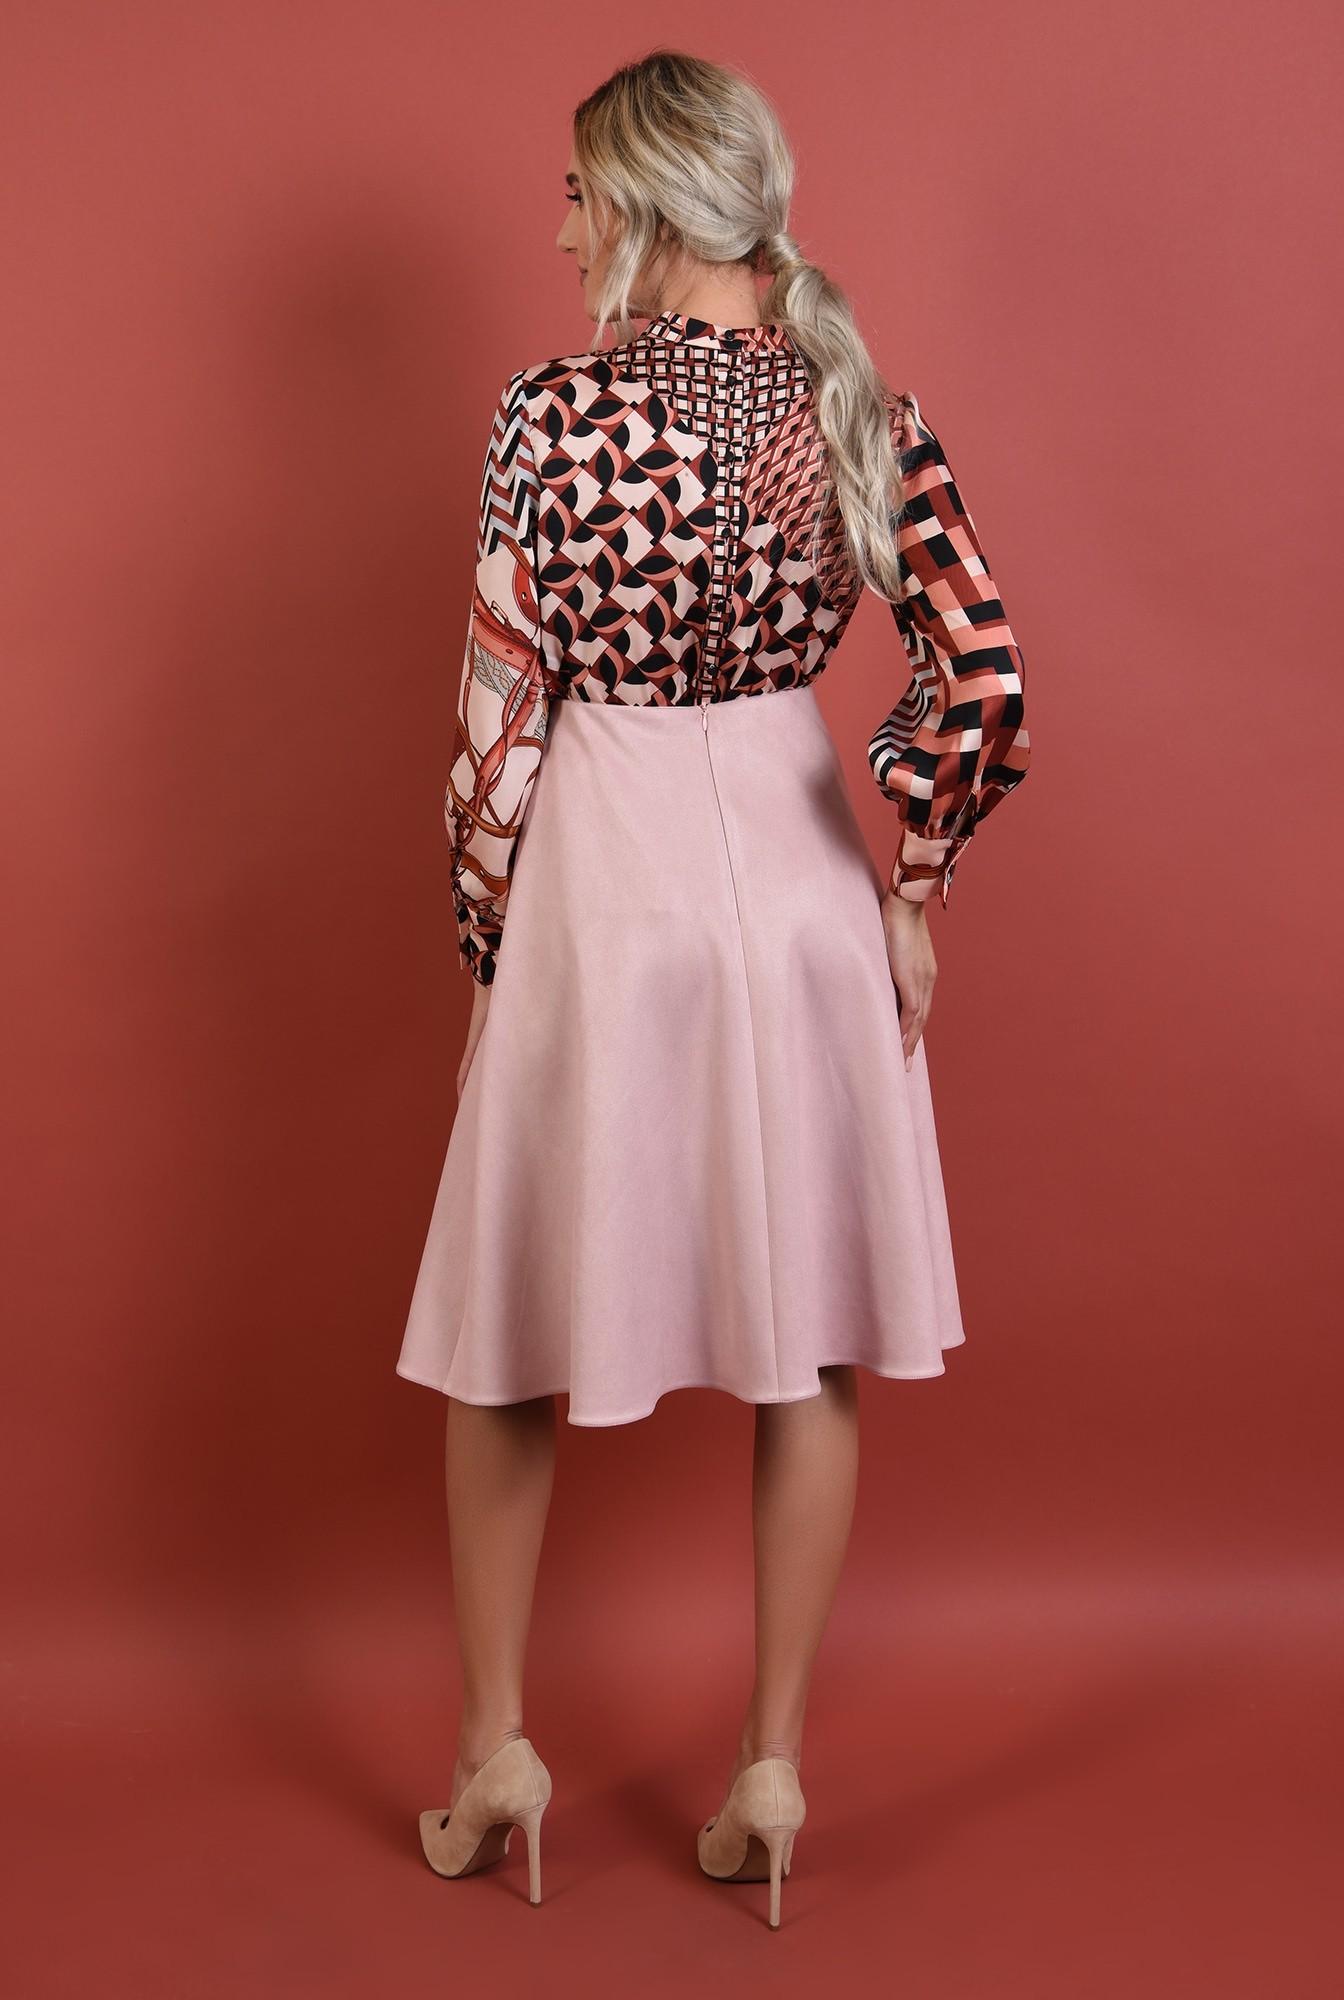 1 - 360 - fusta evazata, roz pudrat, talie inalta, cu betelie, casual